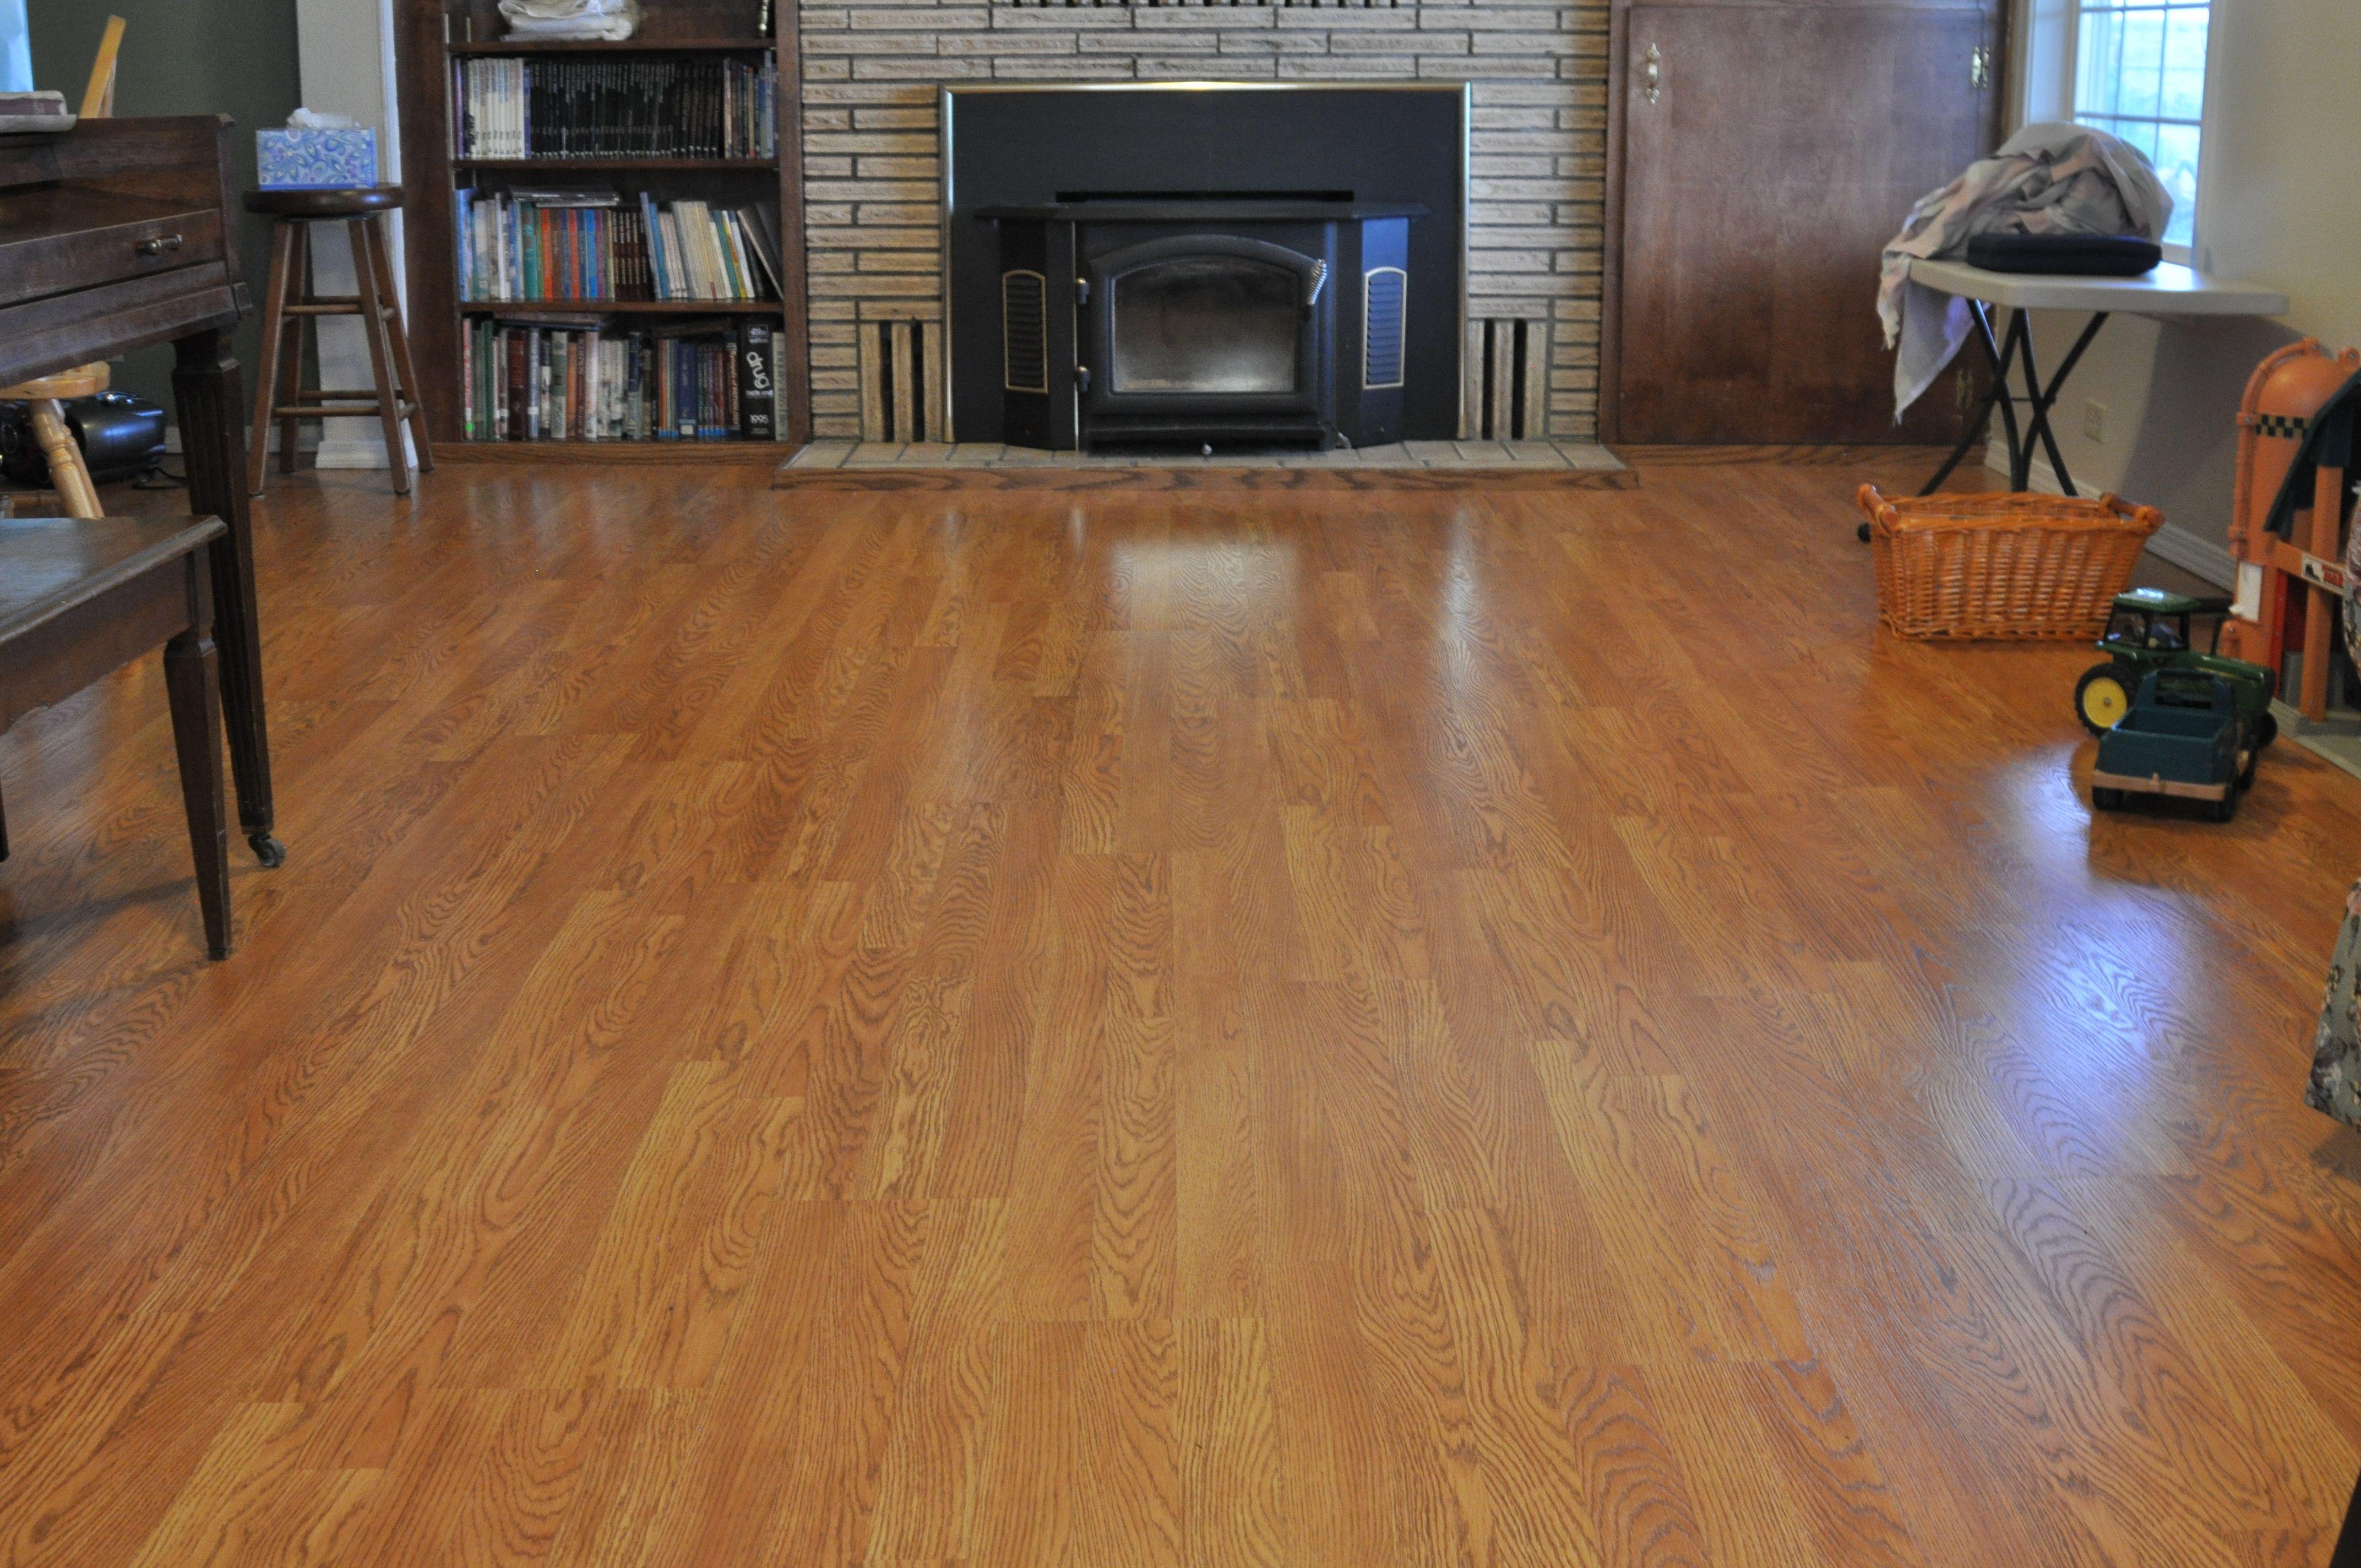 Pergo Accolade Waverly Oak Laminate Flooring Photo Compliments Dwight C